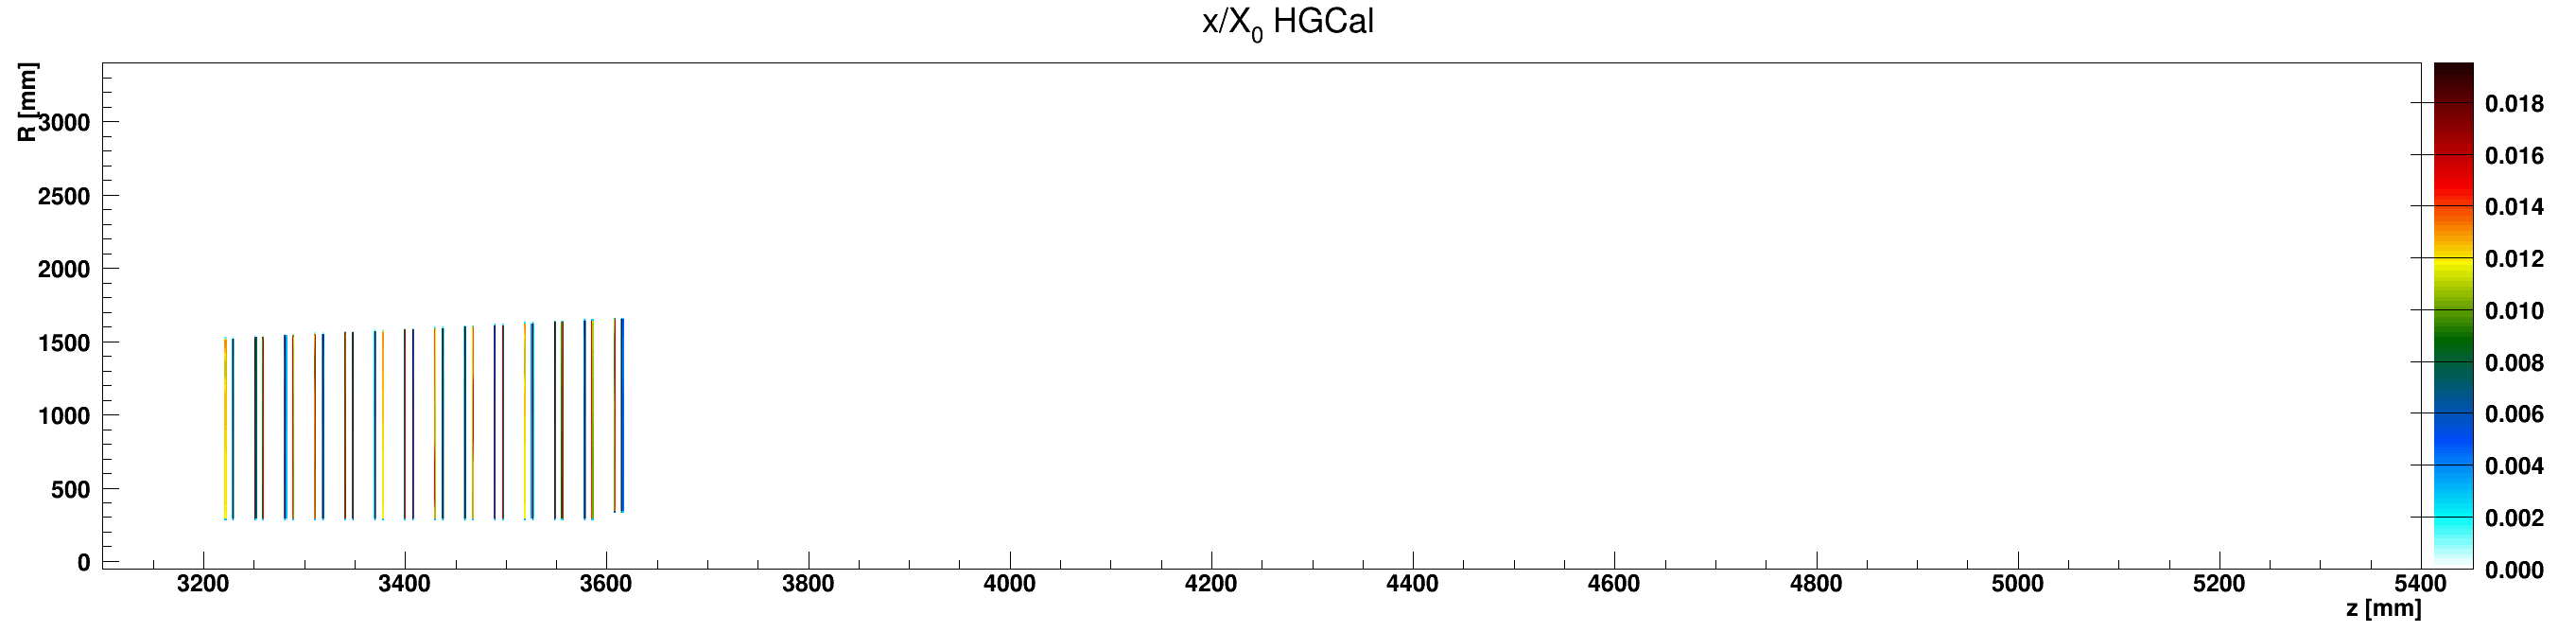 HGCal_x_vs_z_vs_RlocWCu_ZplusZoom.png